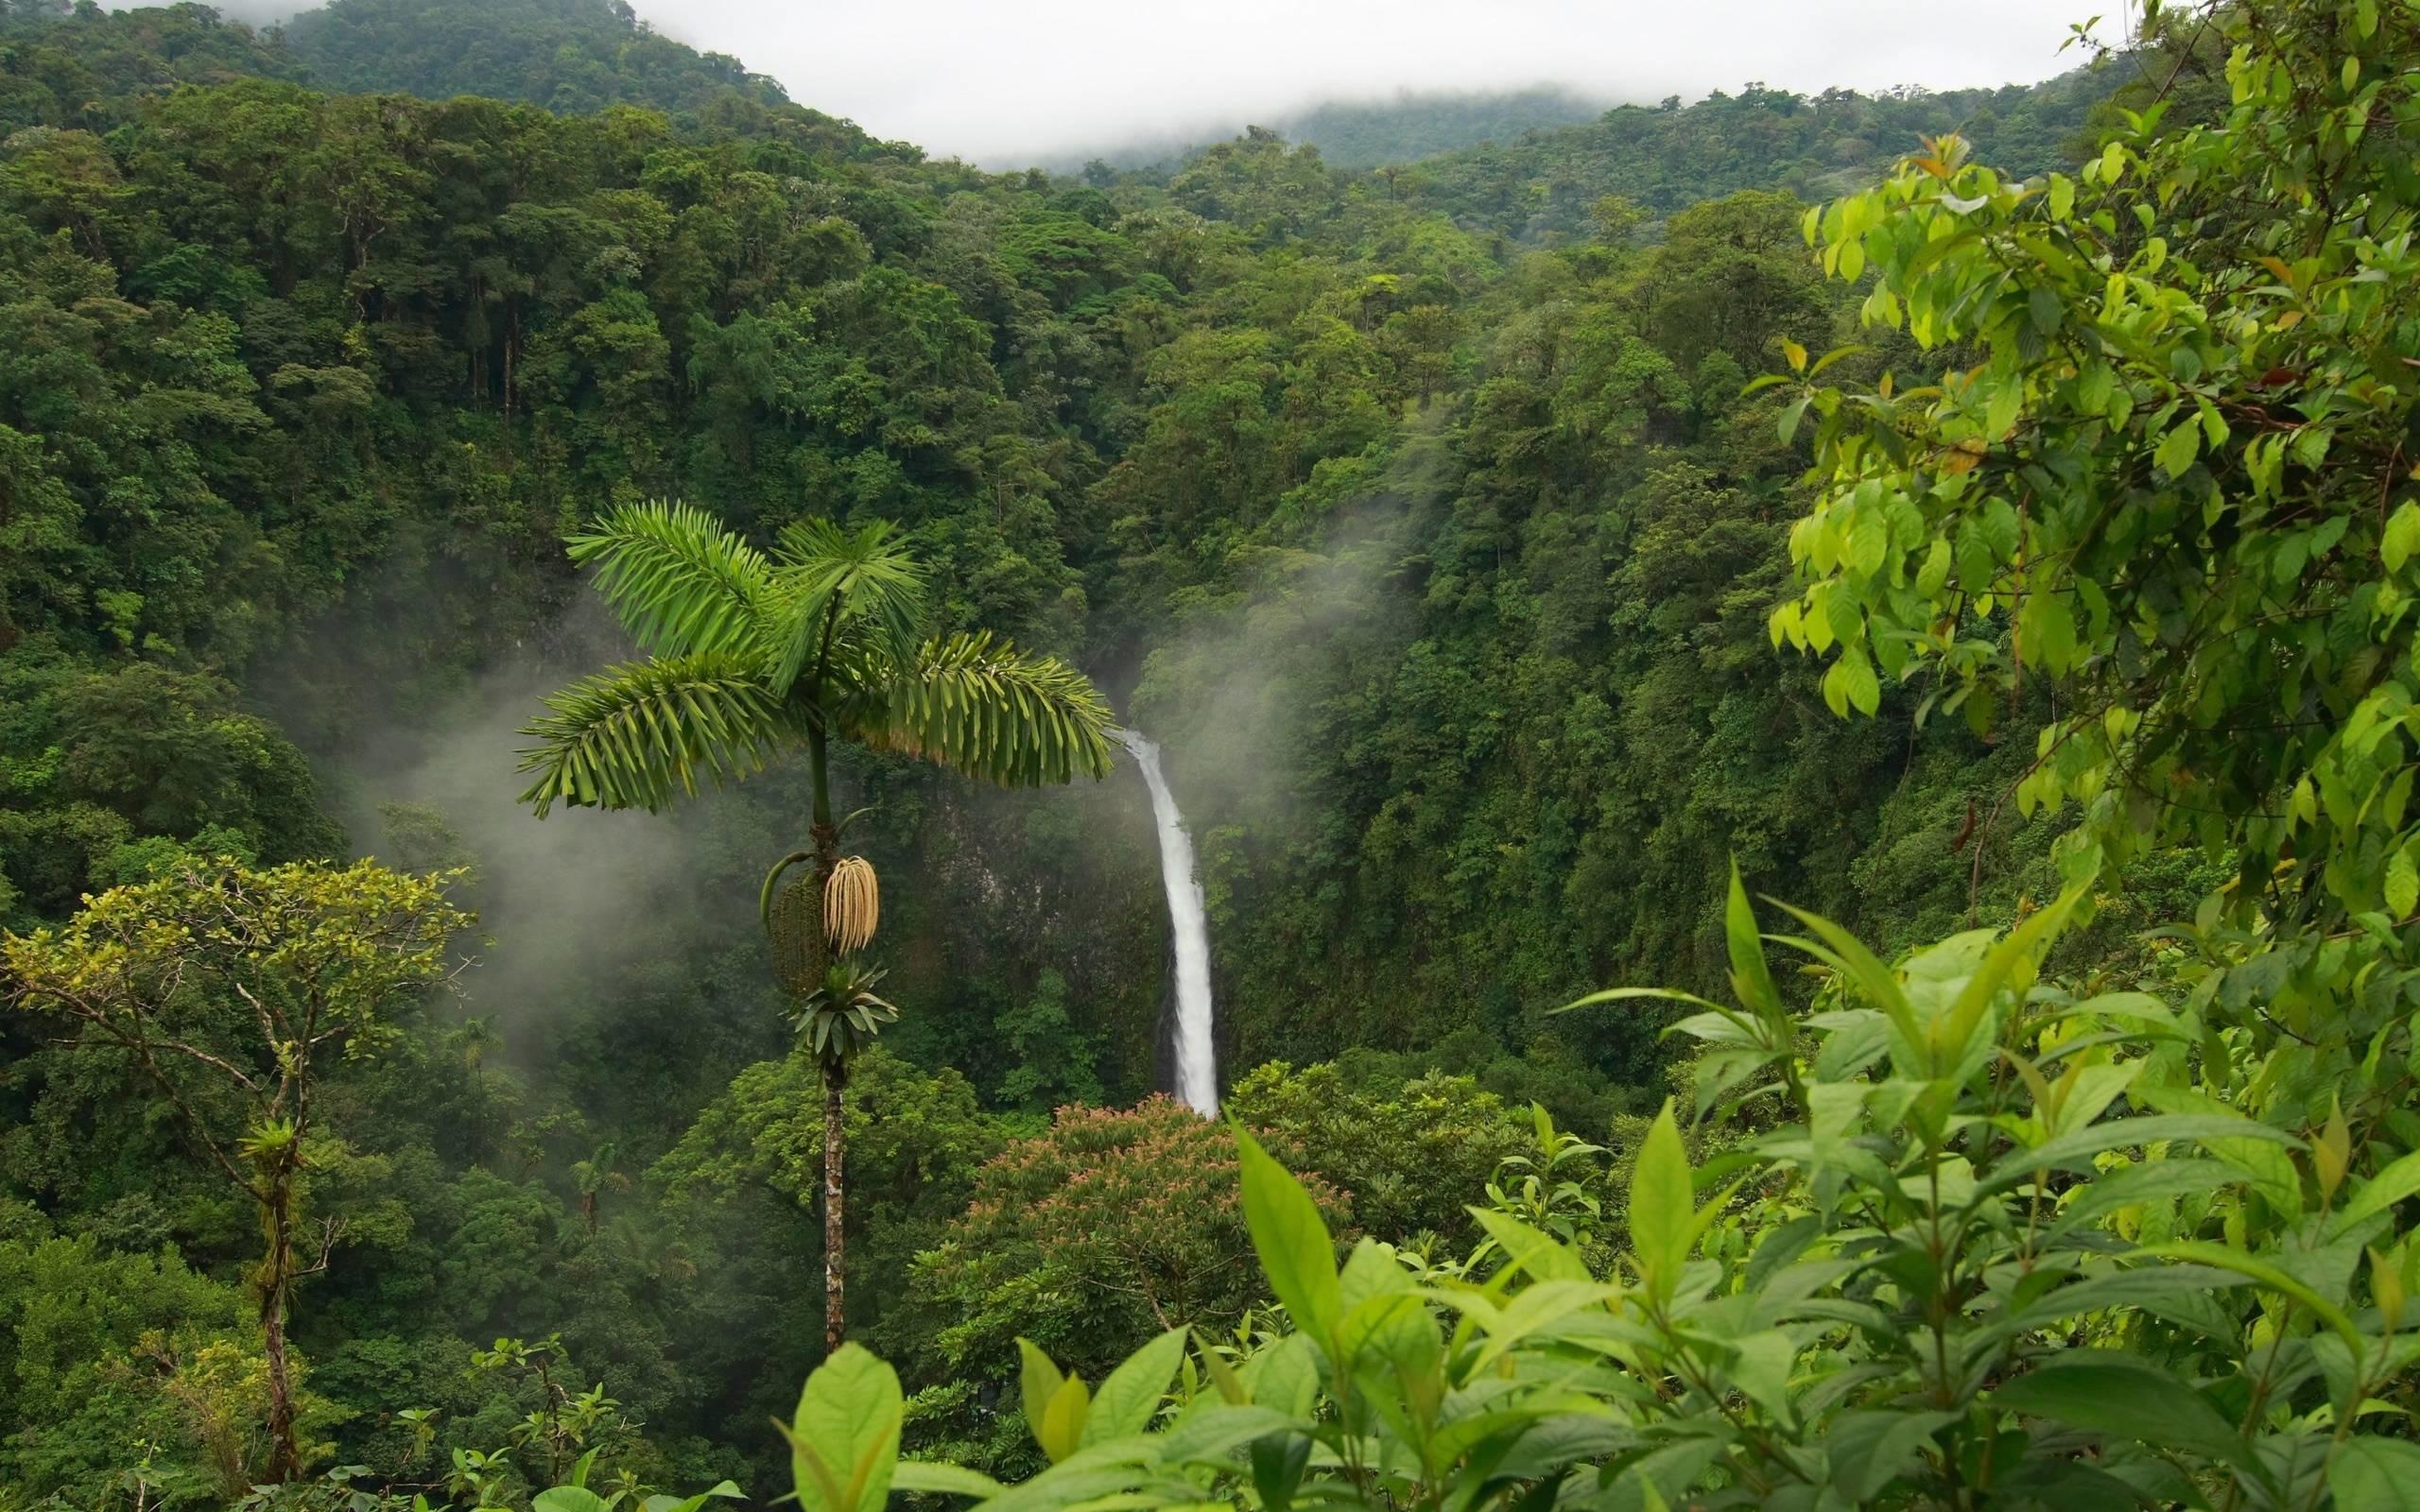 Wallpapers For > Rainforest Wallpaper Hd